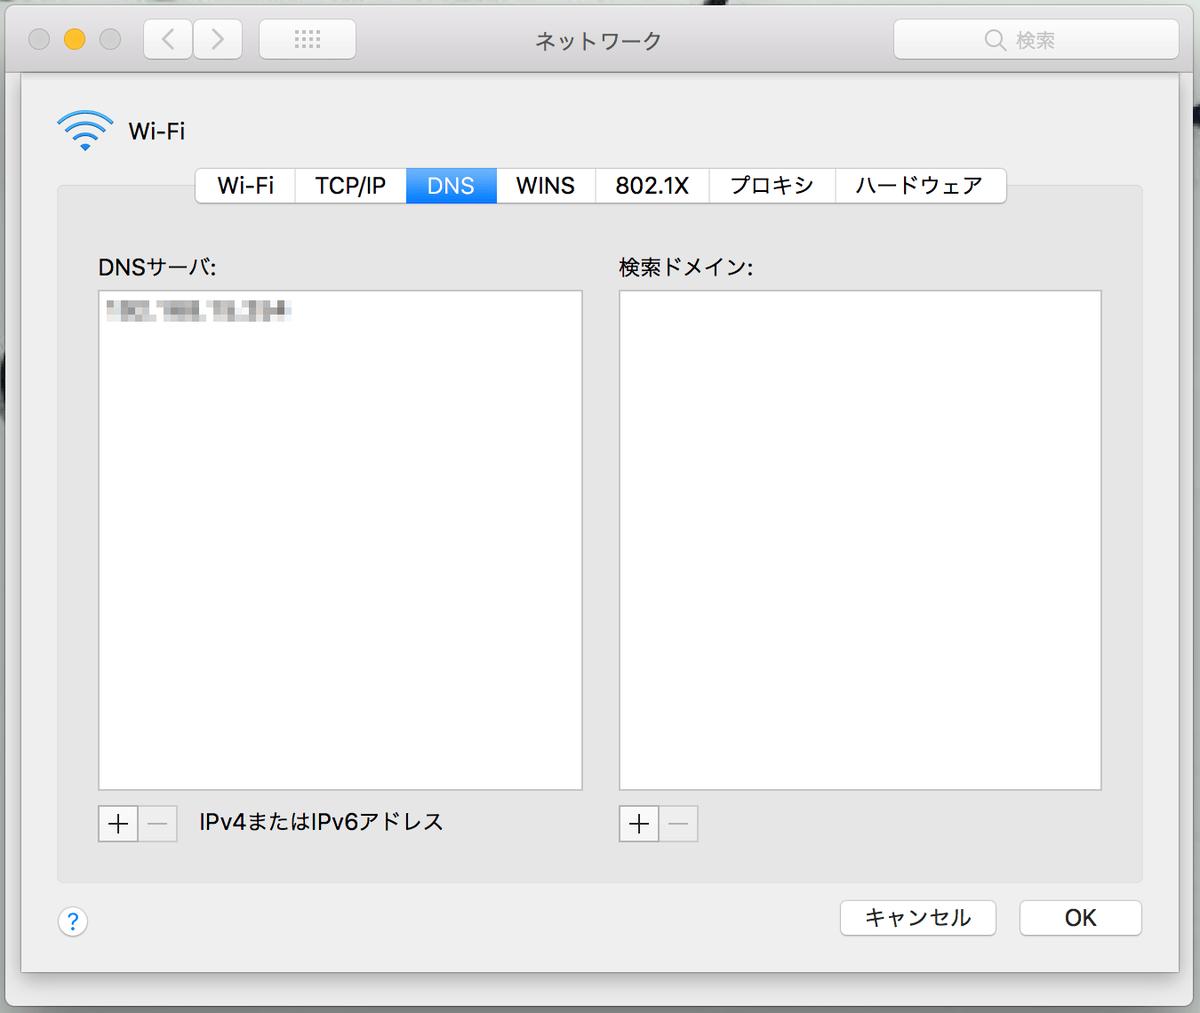 f:id:kikiki-kiki:20190803143348p:plain